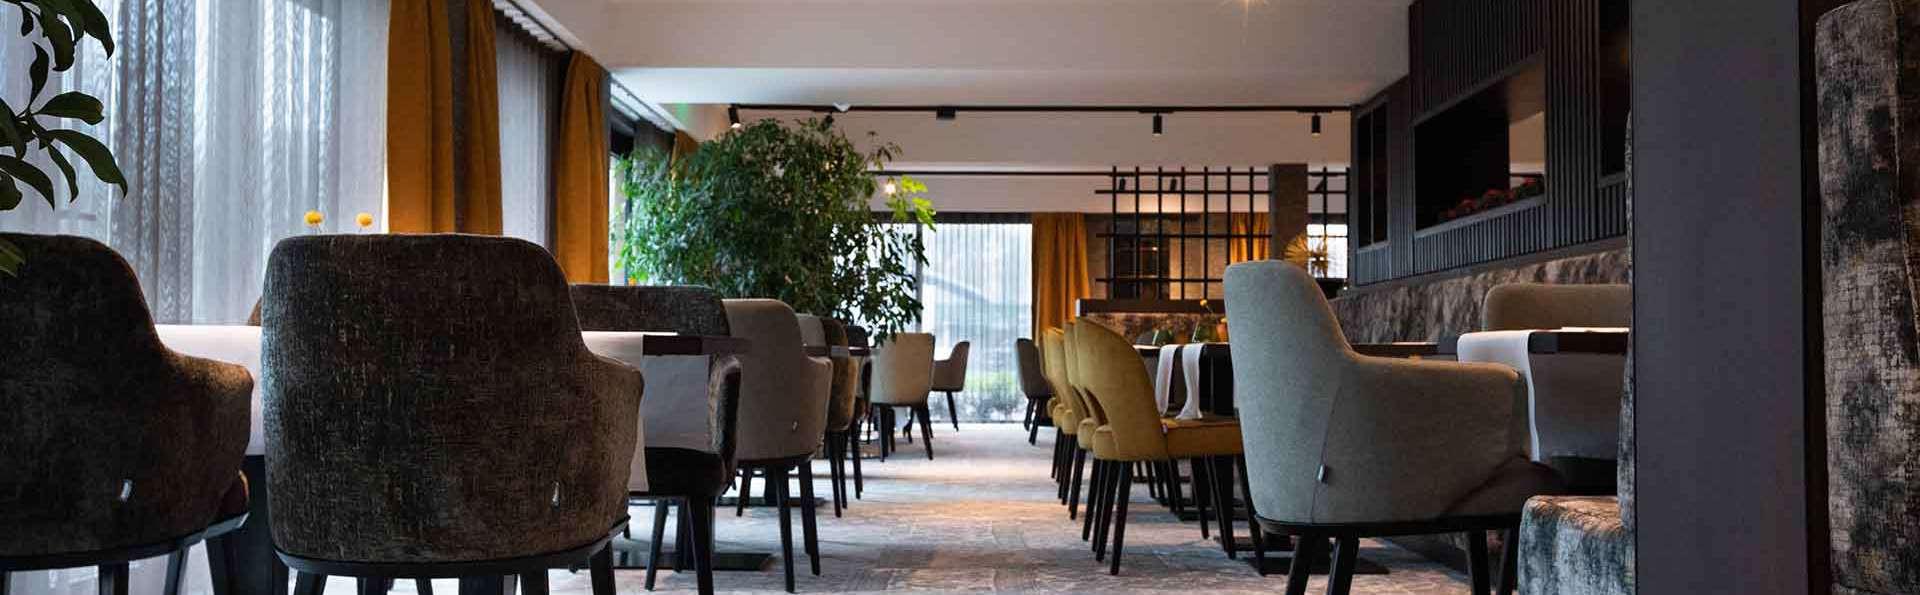 Hotel Gorinchem - EDIT_RESTAURANT.jpg